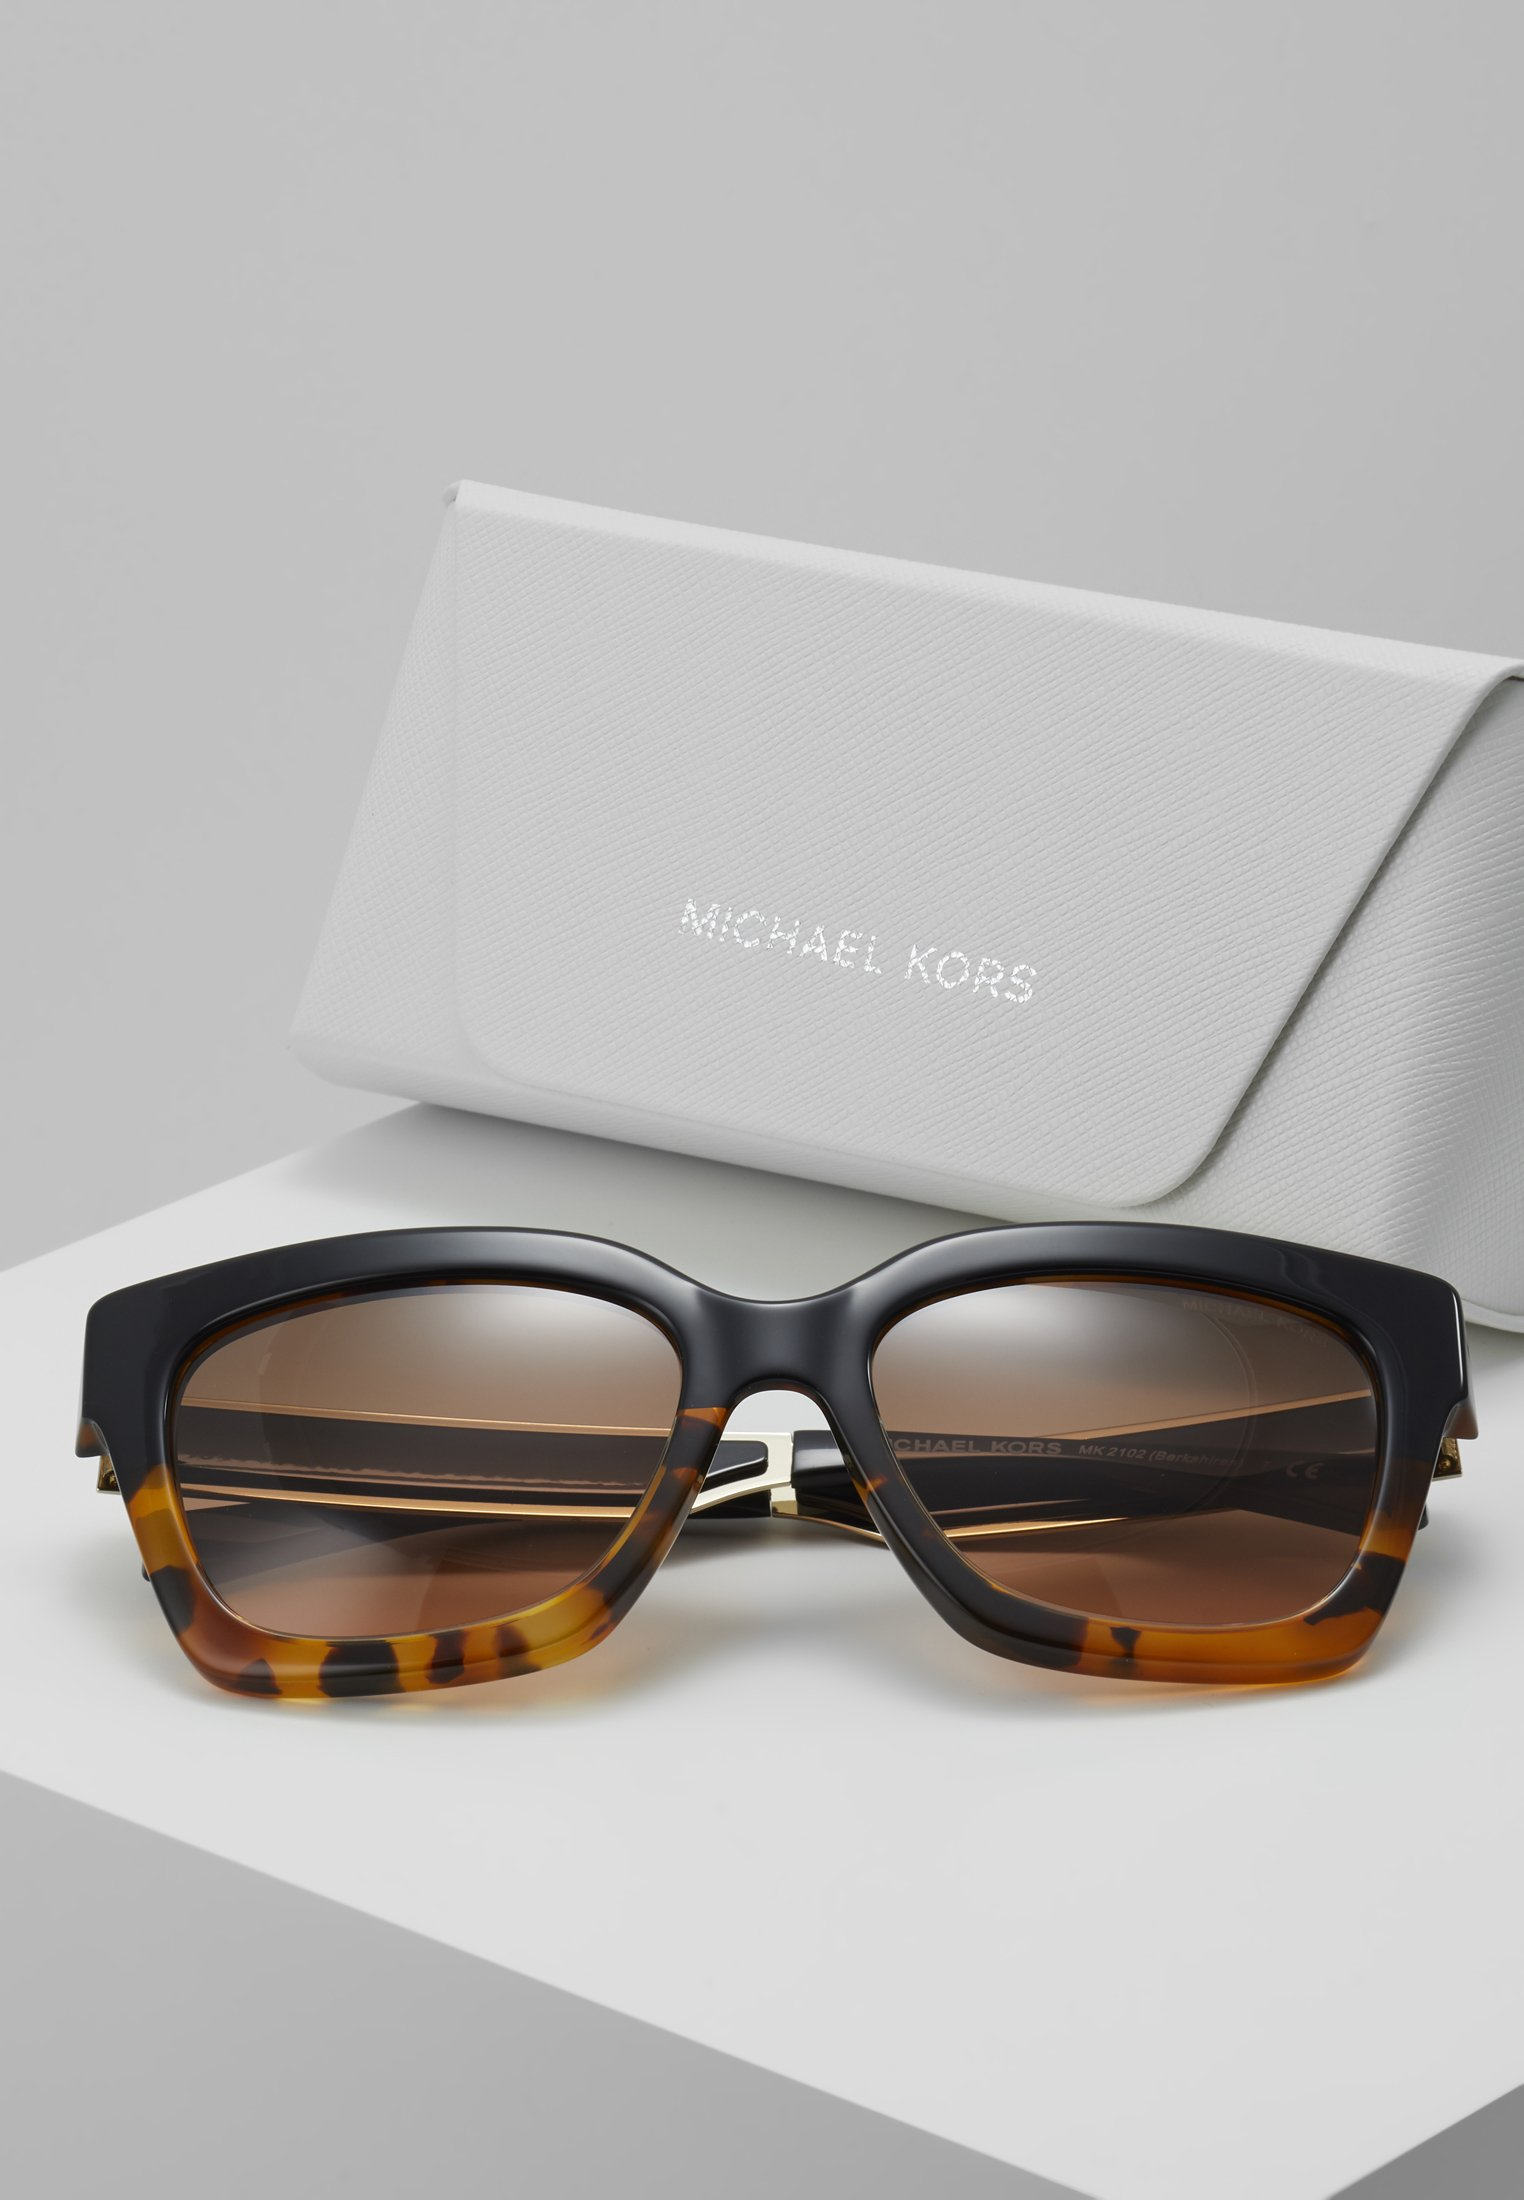 Michael Kors Solbriller - block blacktort/svart aTcR4pfQrMRQfoK